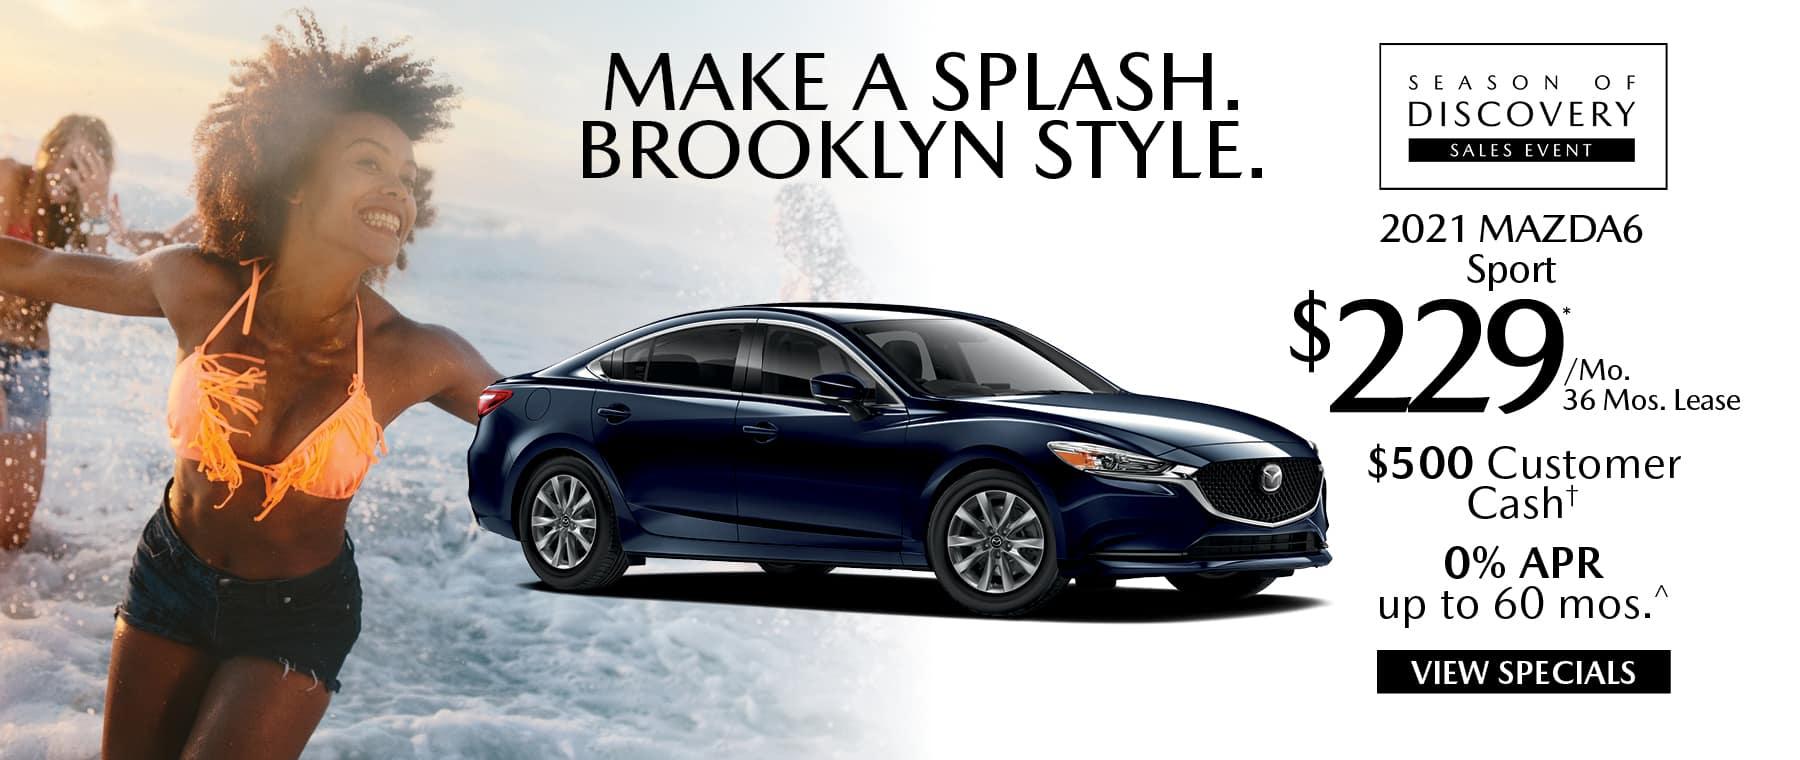 BRMA-1480 Splash 1800x760_Mazda6_Sport